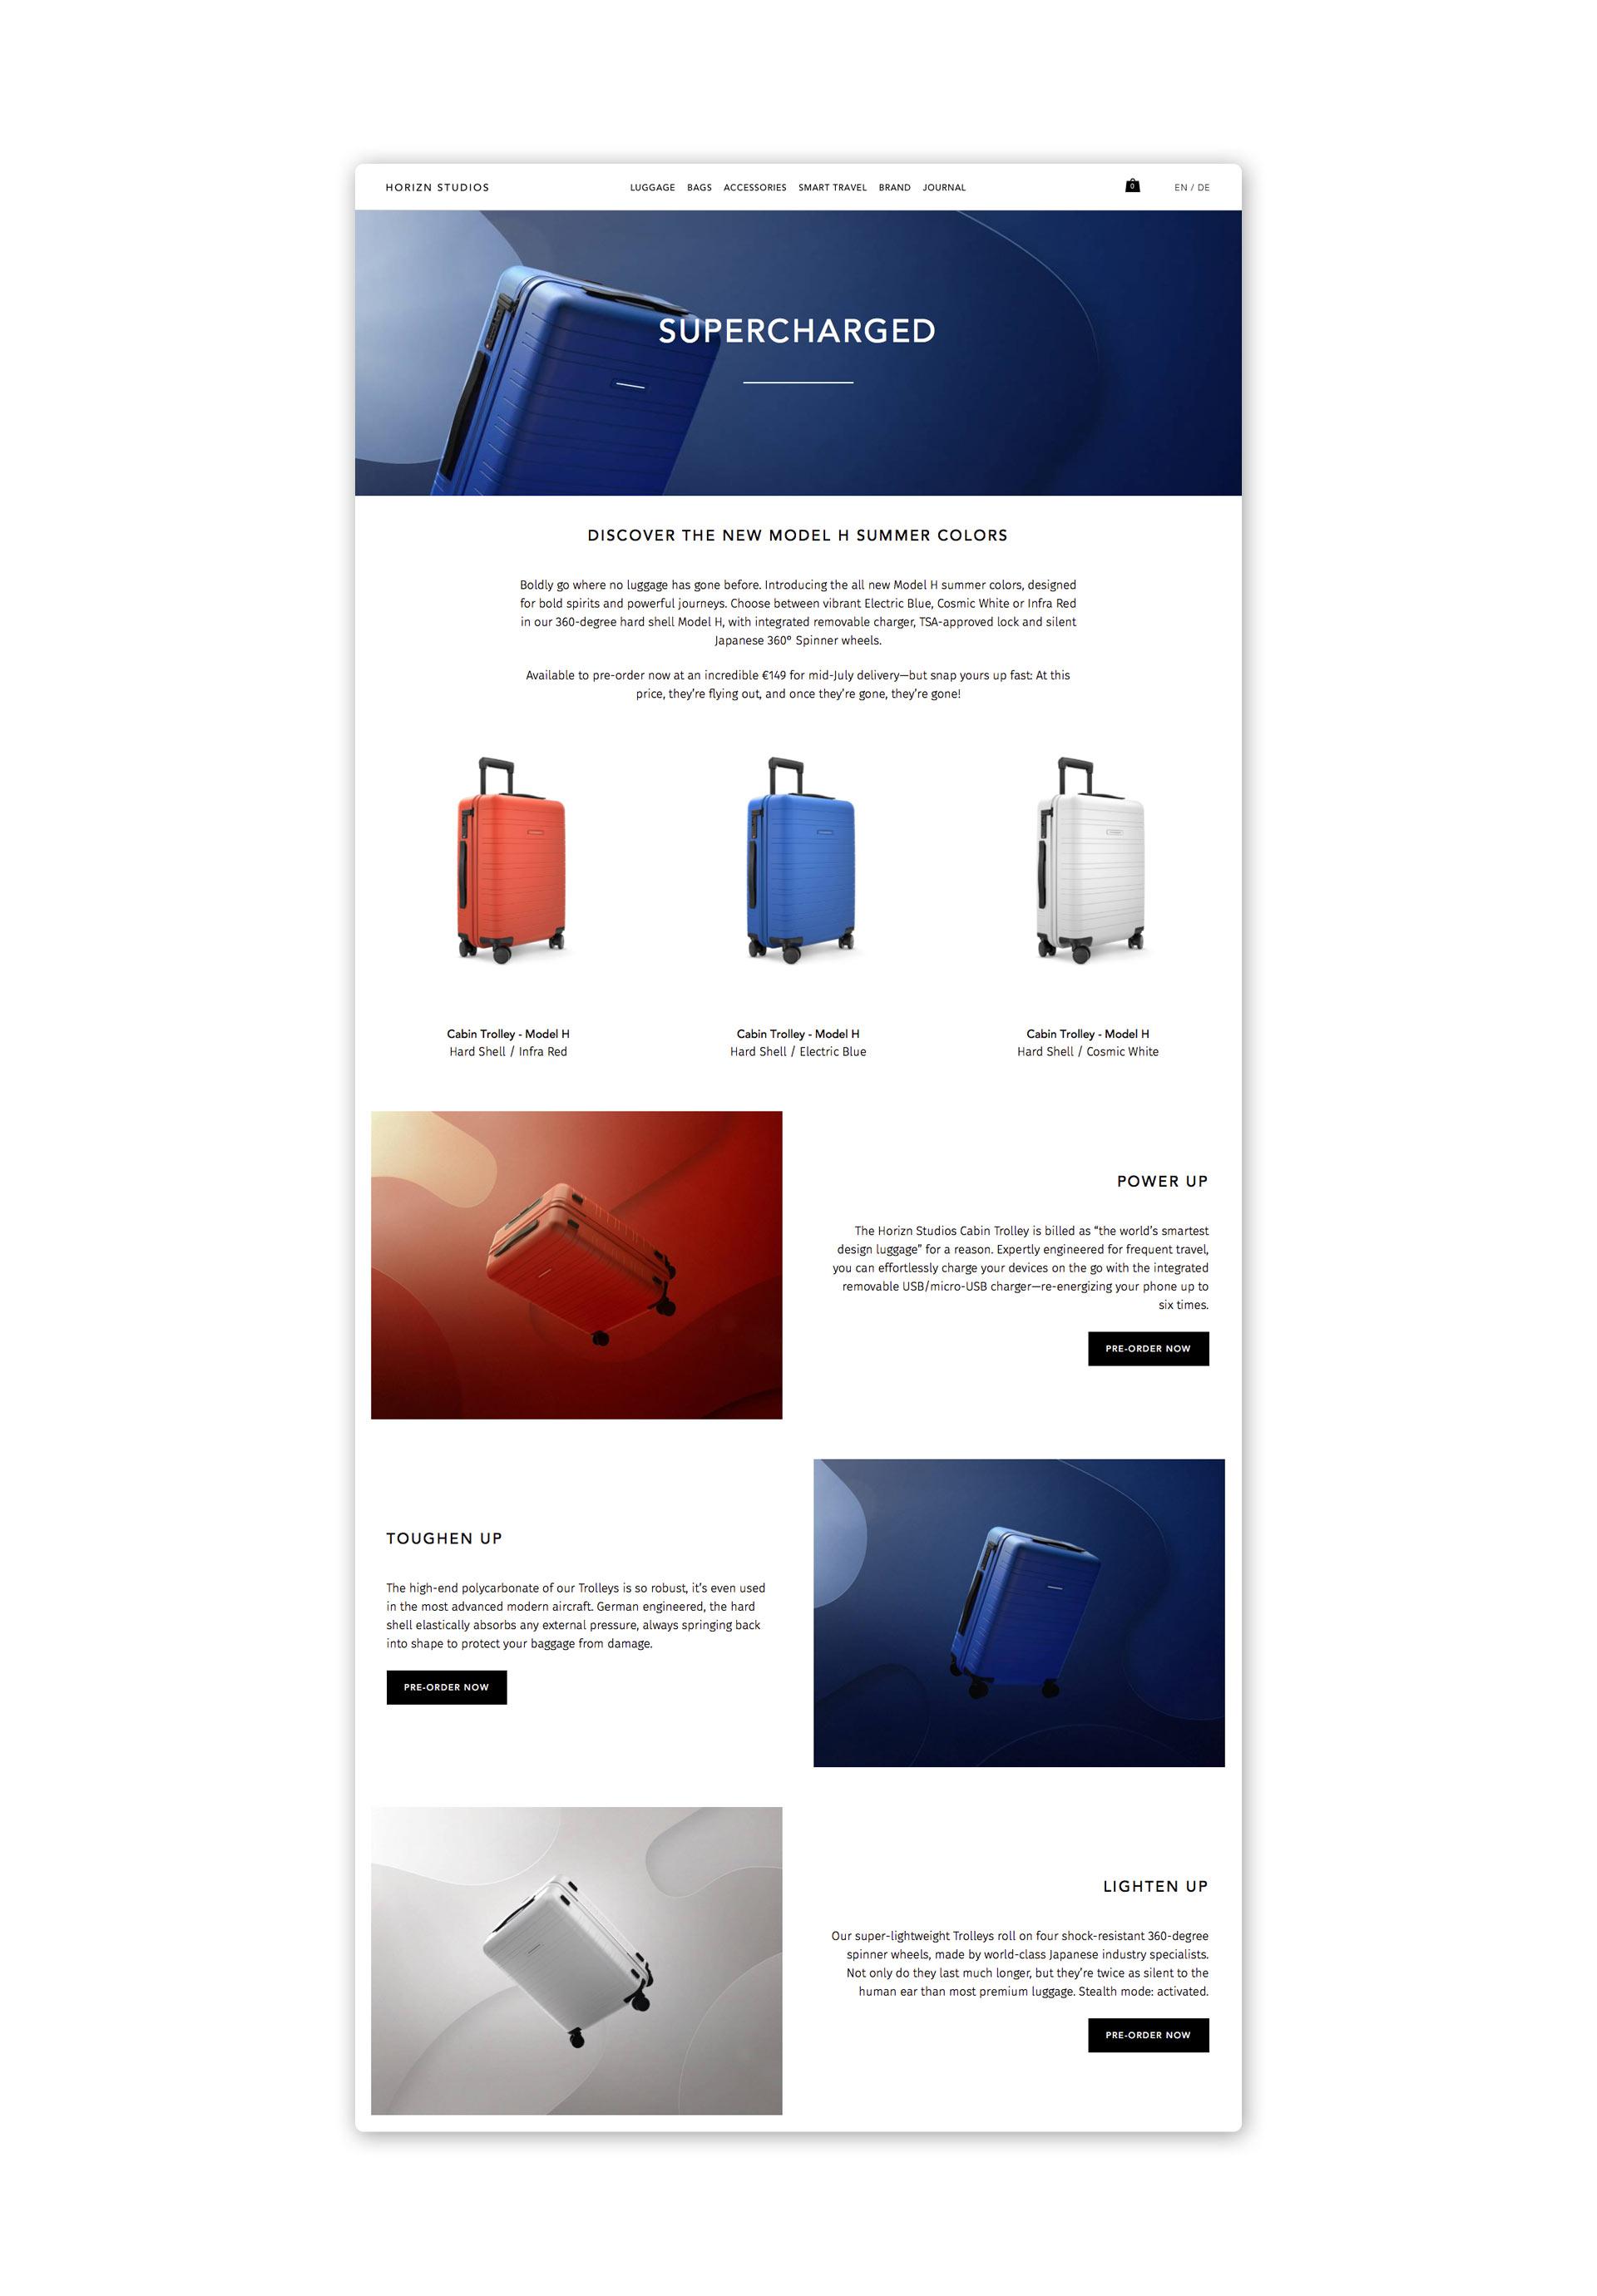 blokstudio_horizn_studios_webpage